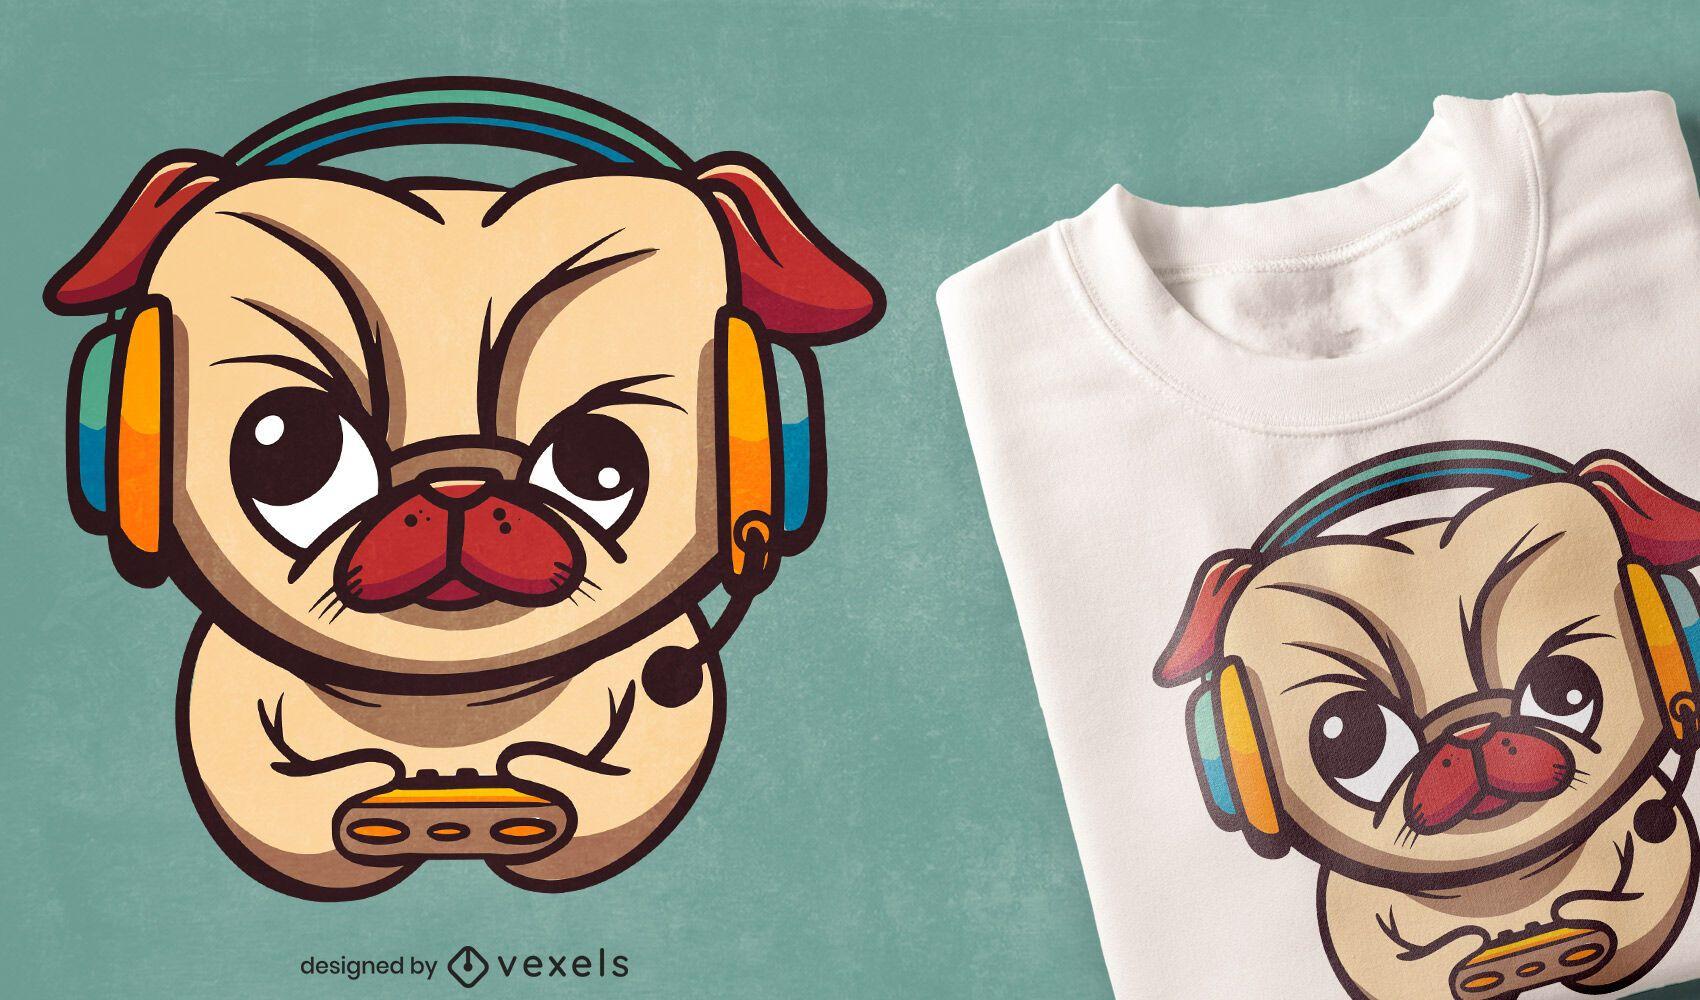 Gamer pug t-shirt design